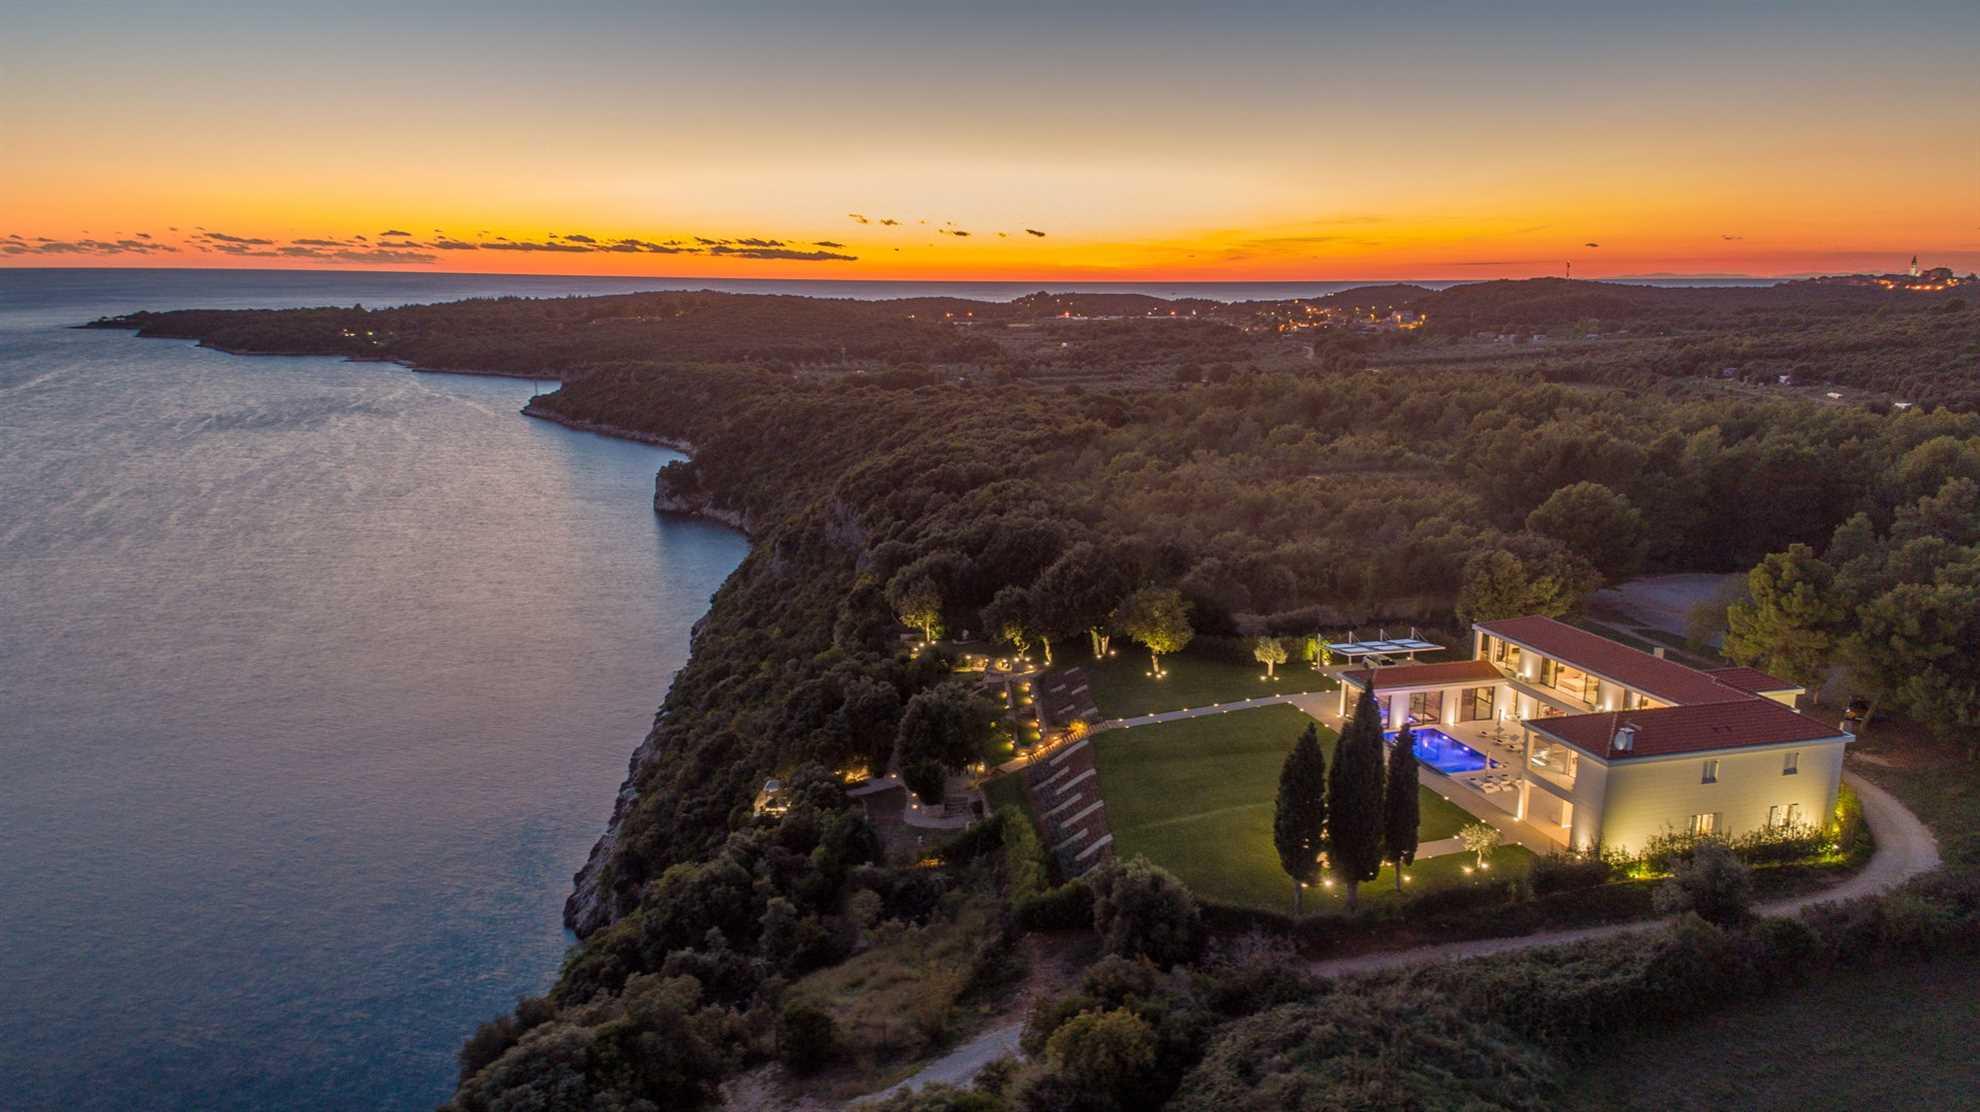 Holiday Villa Bellisima in Istria